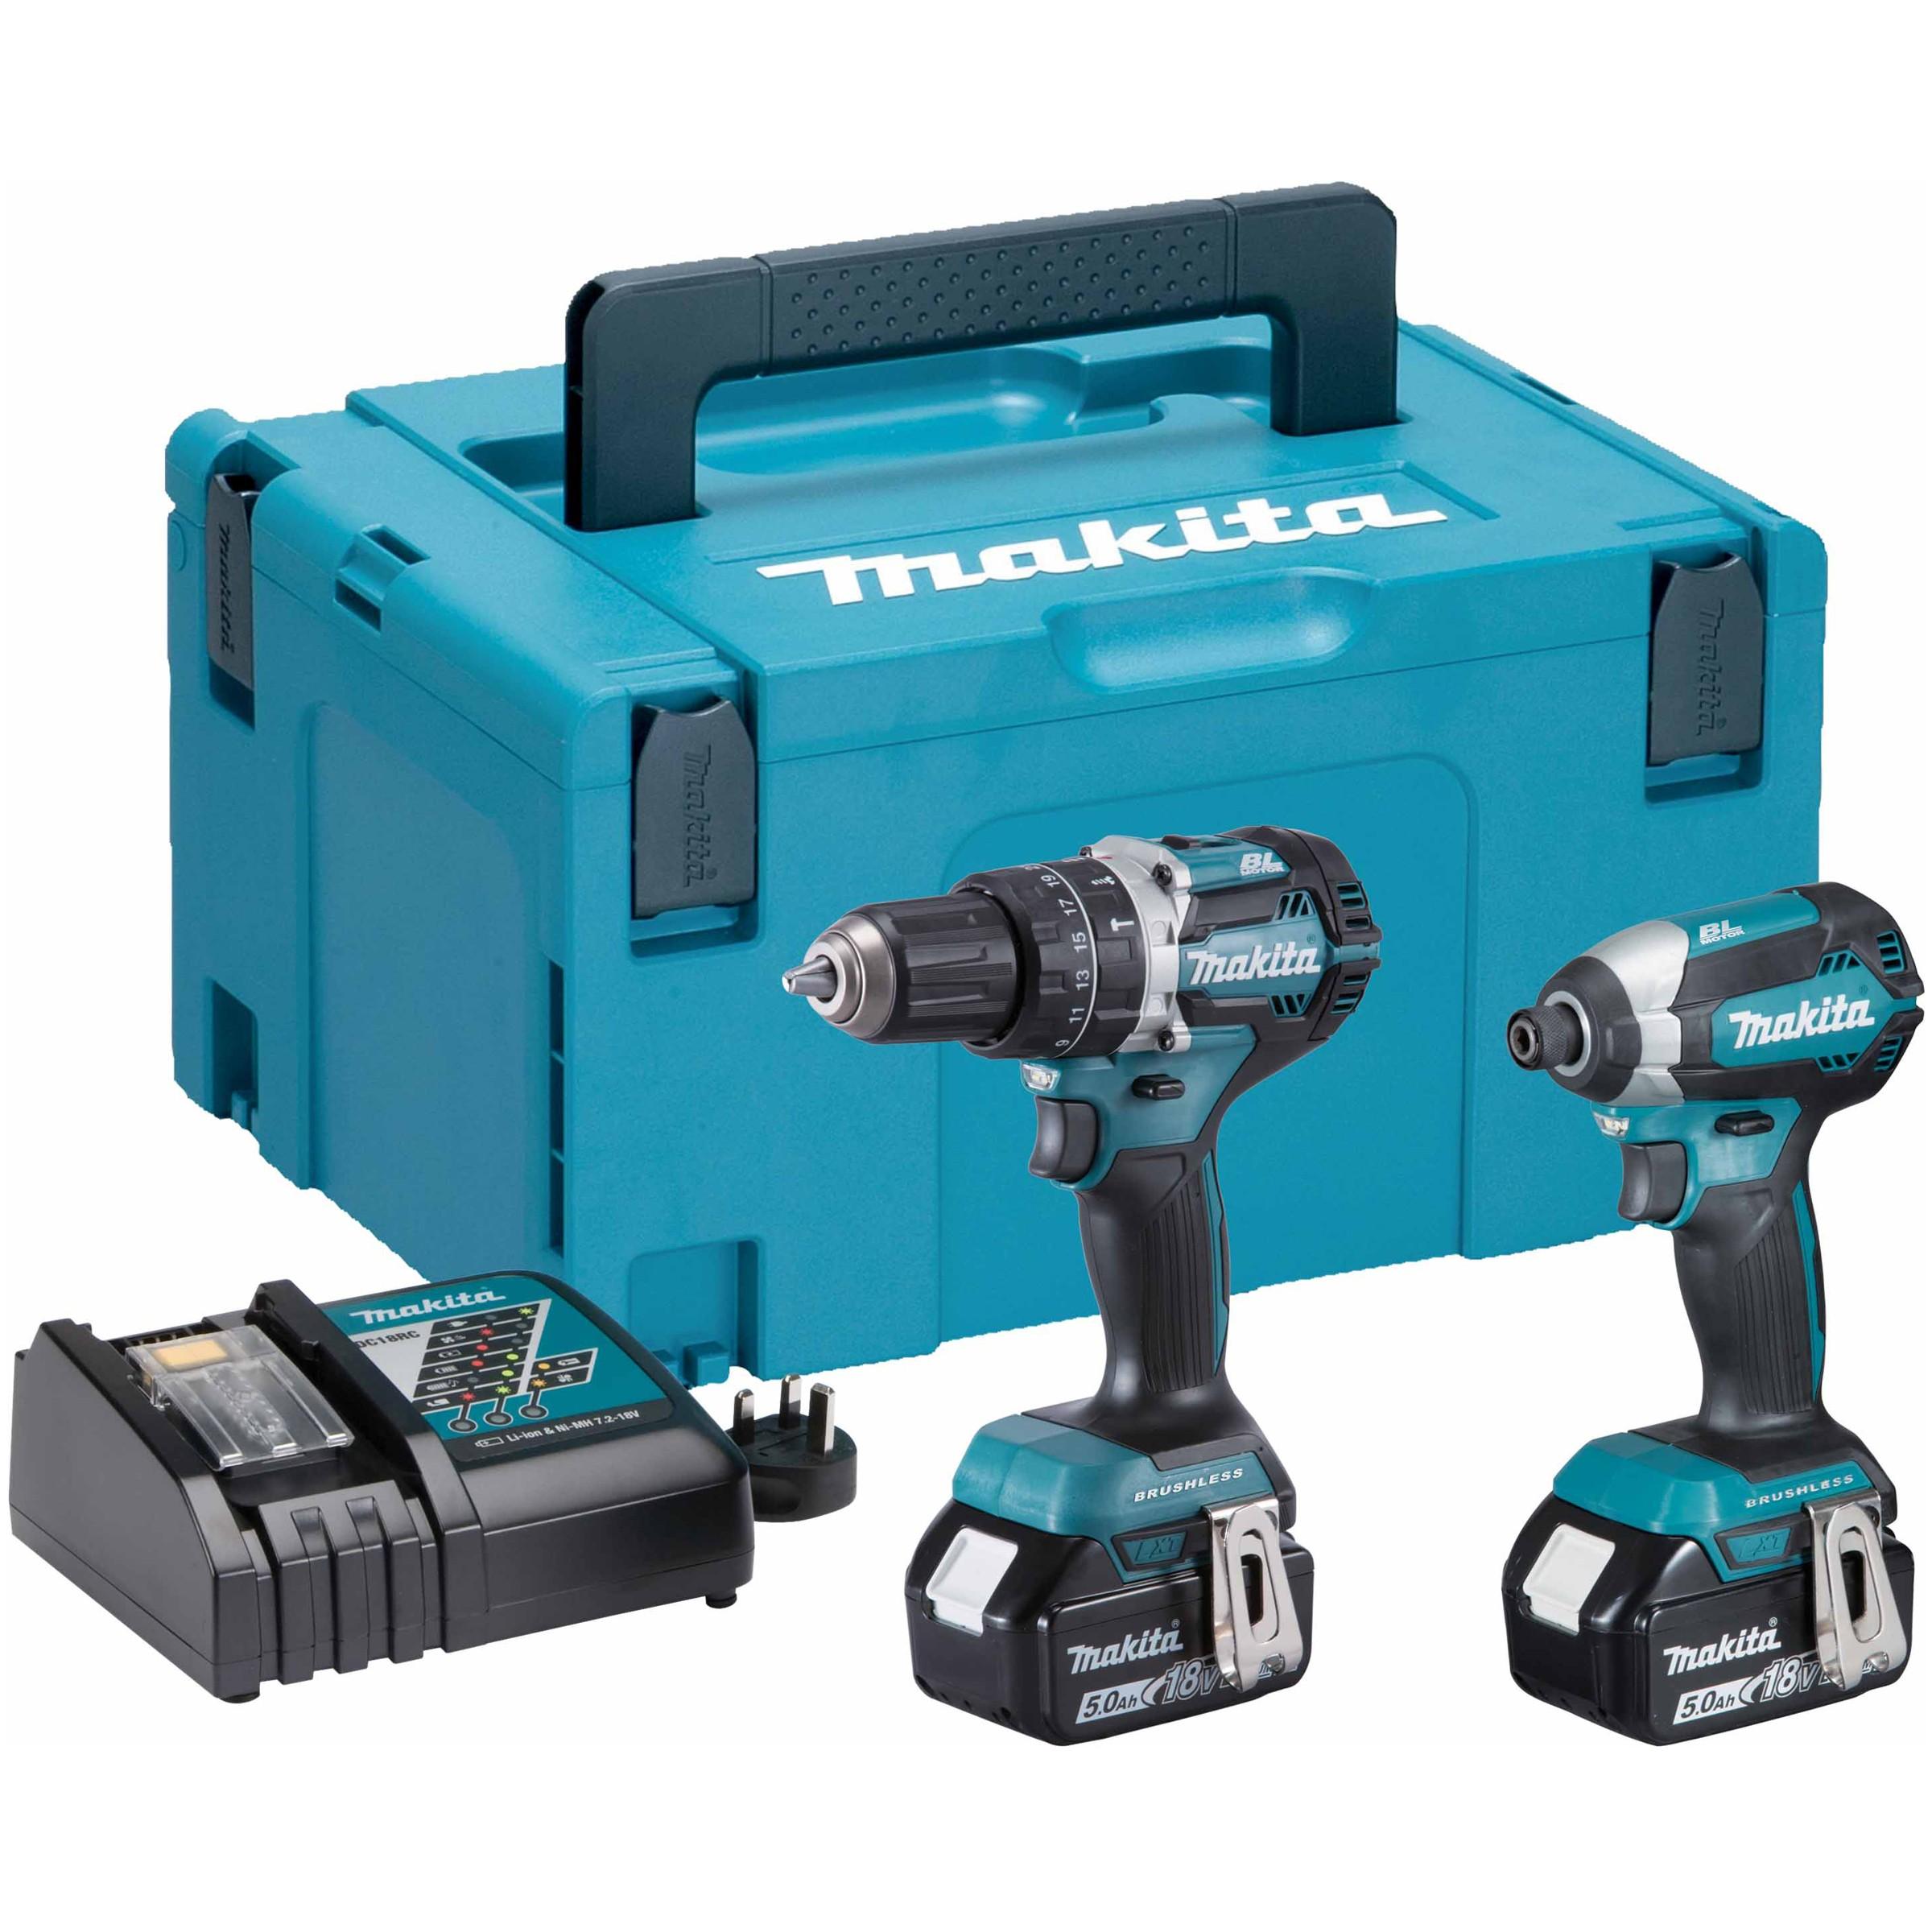 Makita 18V Brushless LXT Combi Drill & Impact Driver - 5.0Ah Pack